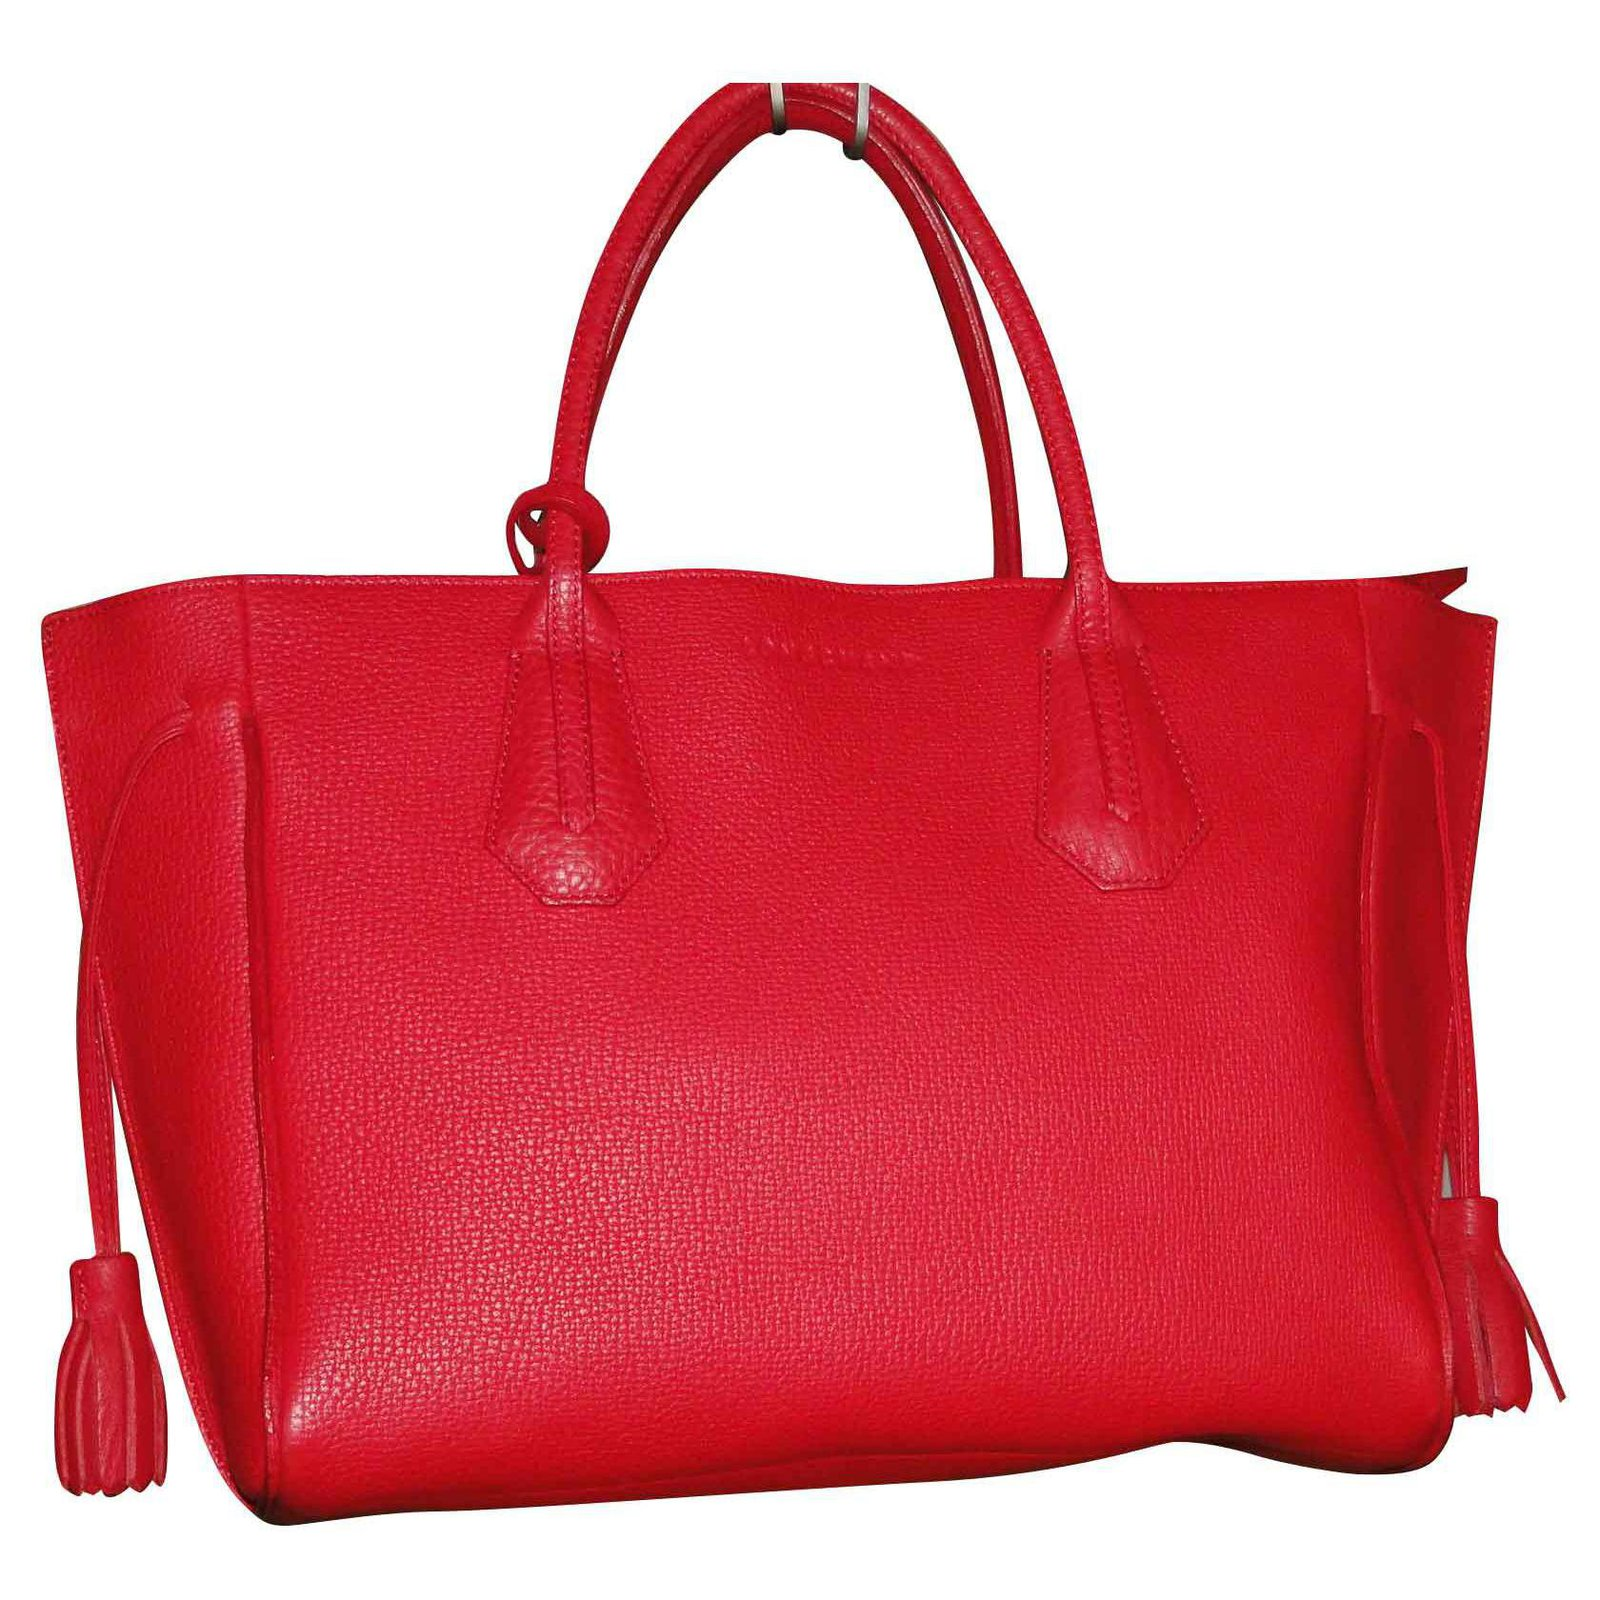 LONGCHAMP Penelope M red bag